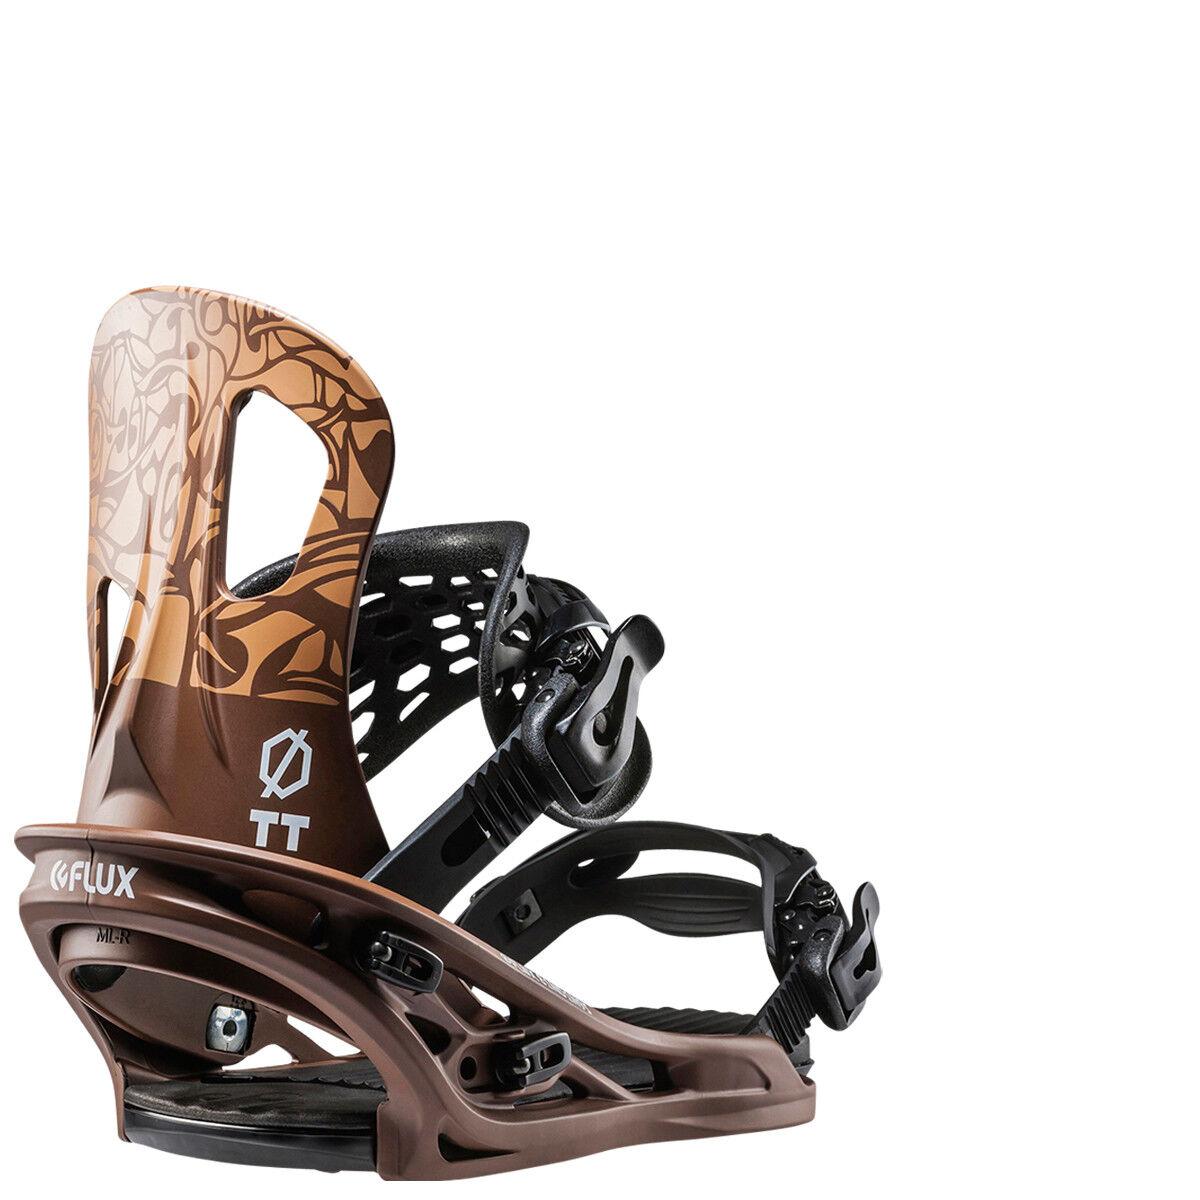 Snowboarding snowboard men bindings FLUX TT brown chocolate S-M-L